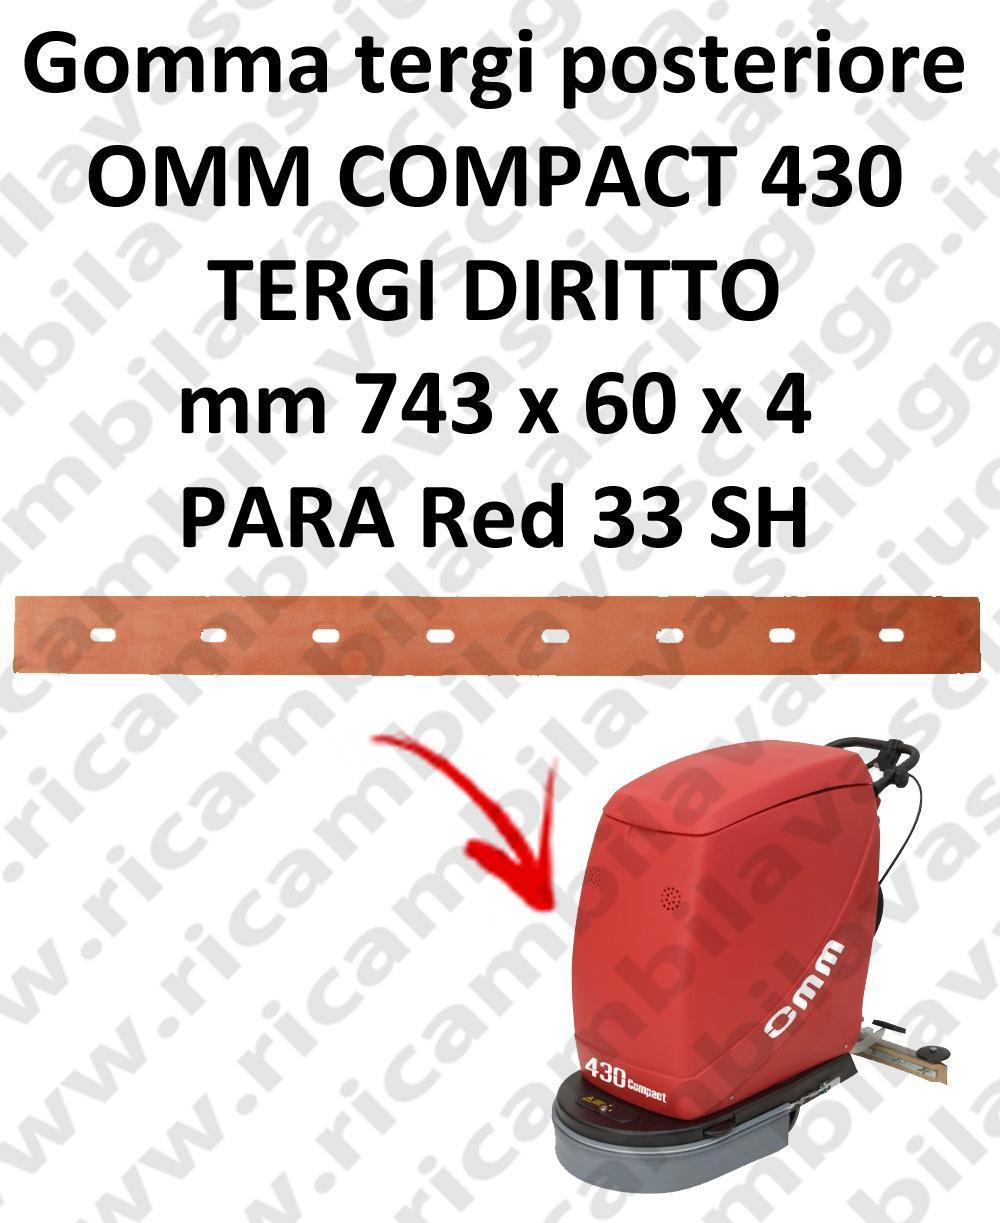 COMPACT 430 gerade saugbalken Hinten sauglippen für scheuersaugmaschinen OMM